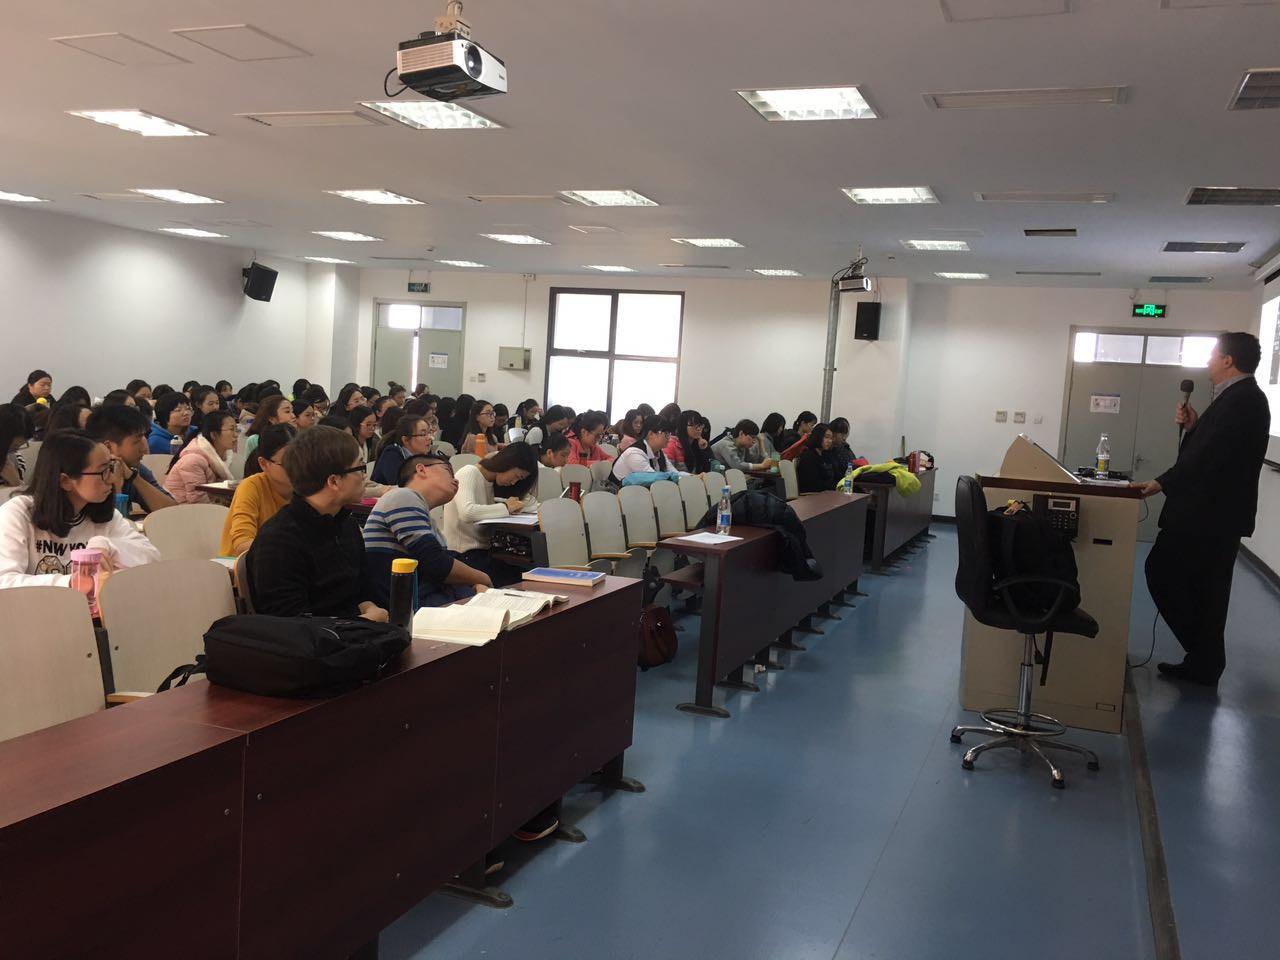 Central University Finance & Economics, and BFSU